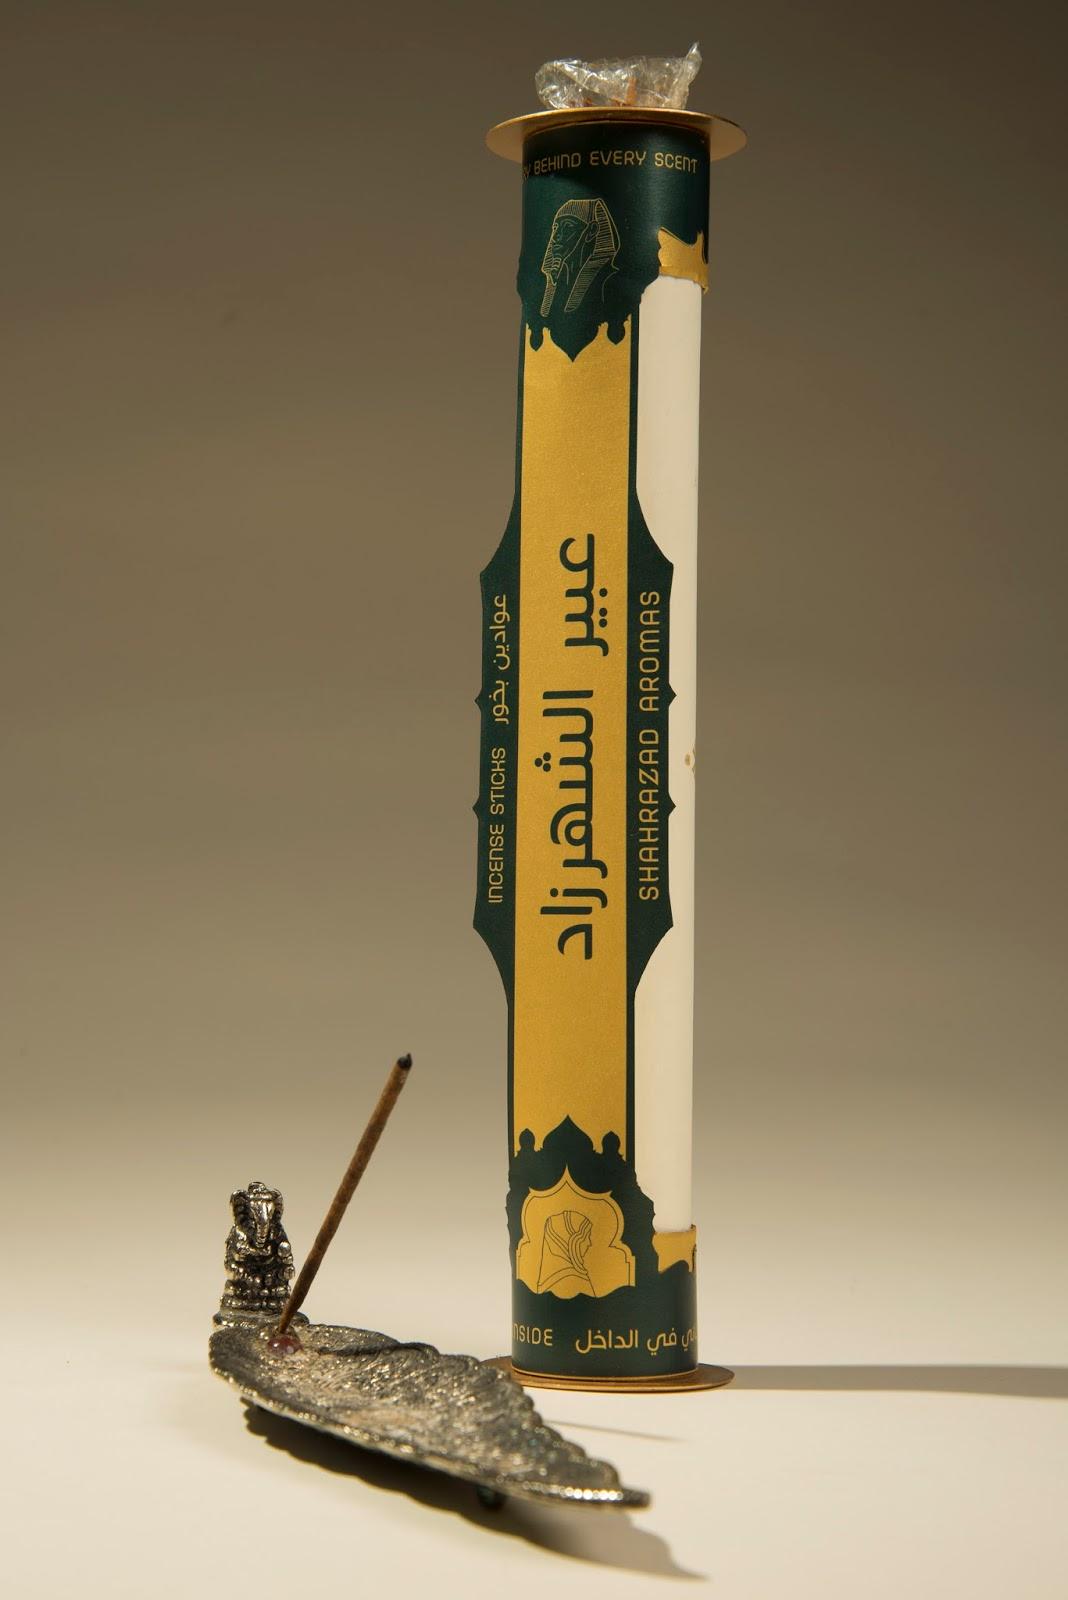 Shahrazad Aromas Incense Sticks - housewares' Labels Designed By Eric Collier